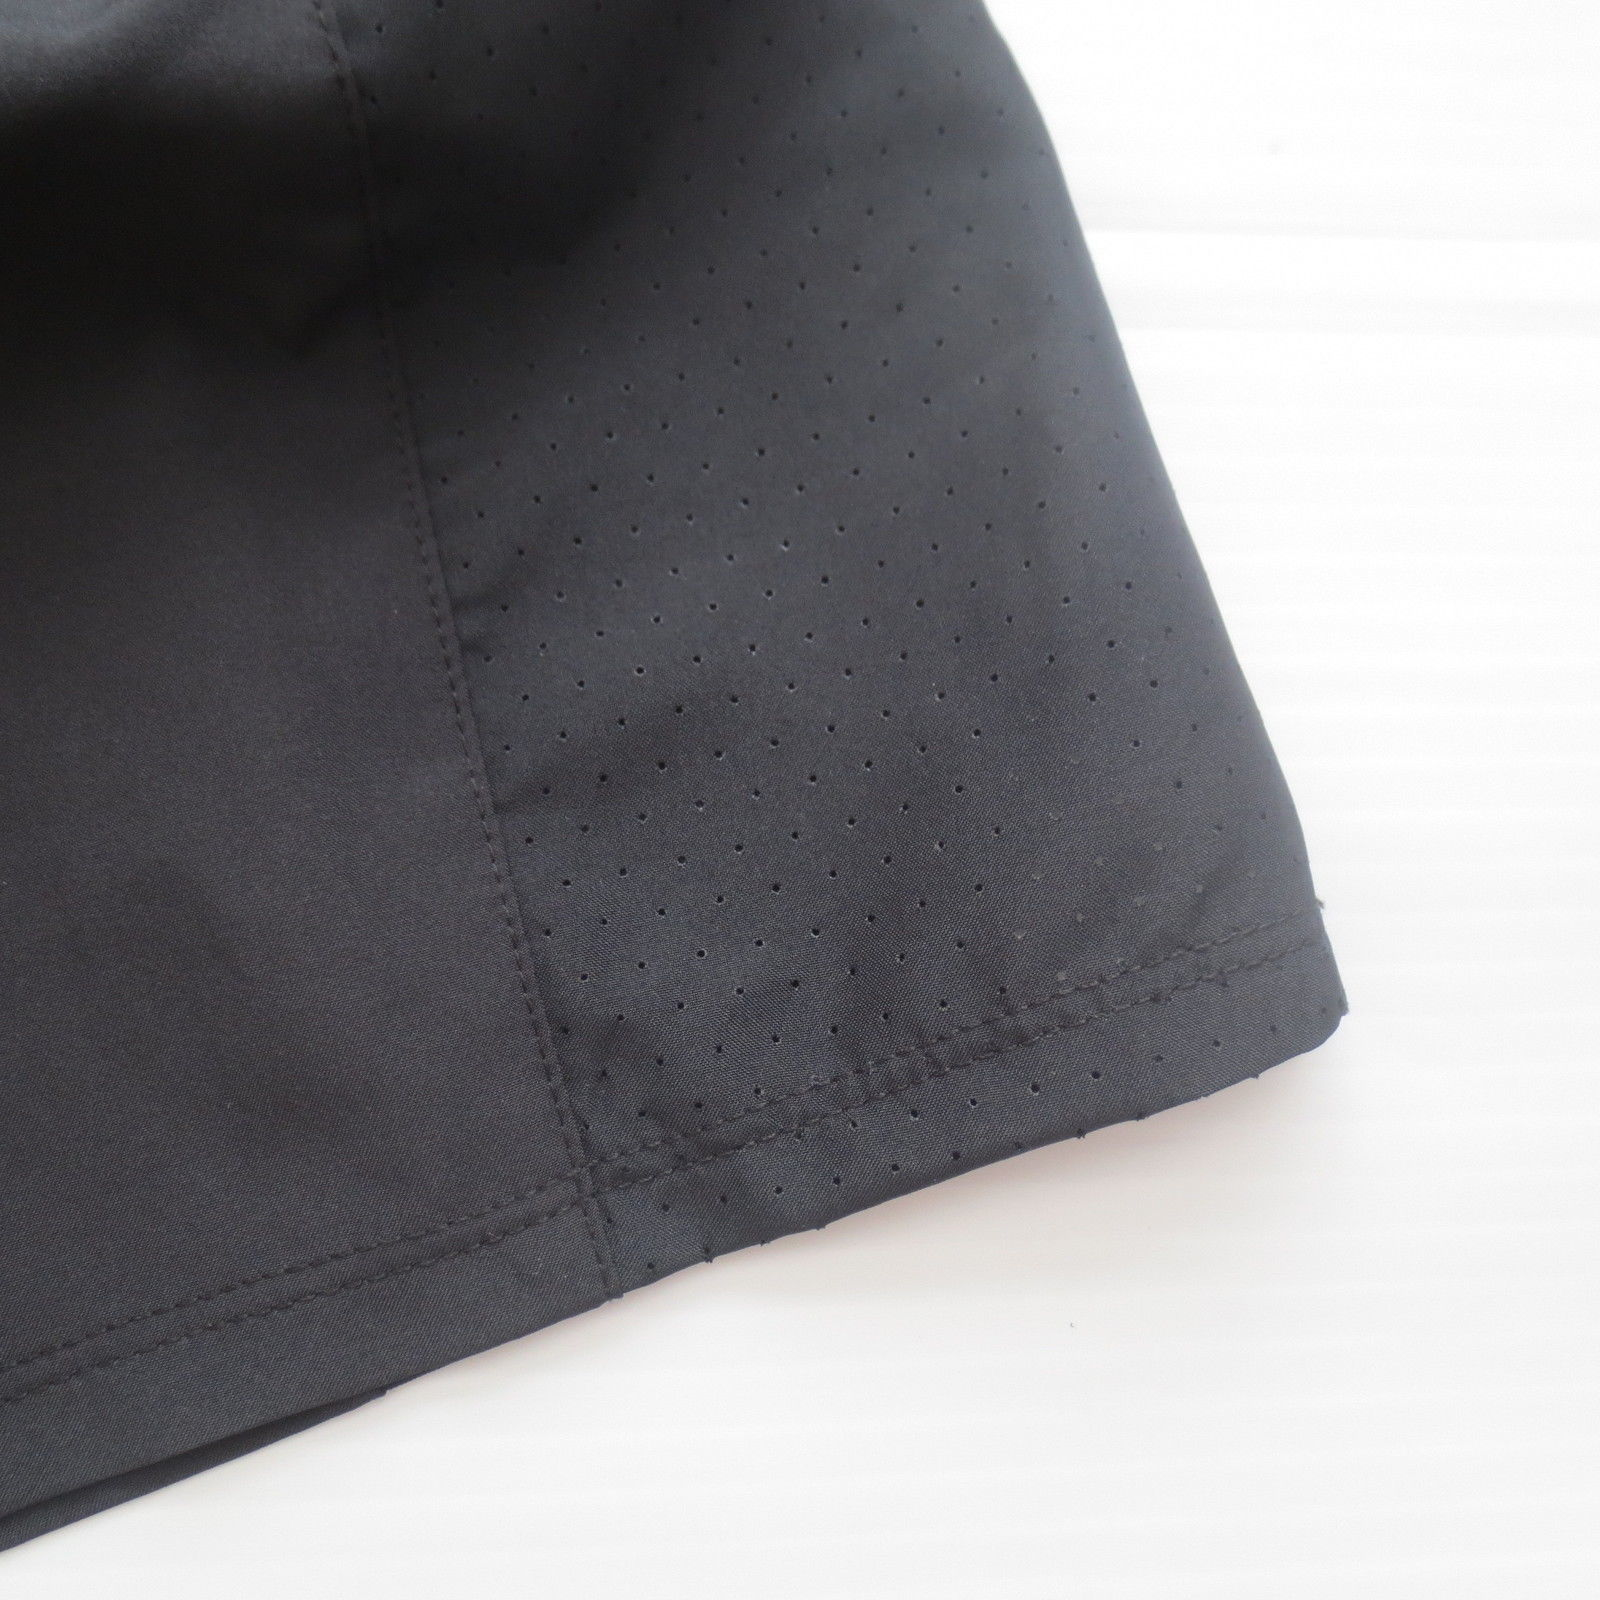 Nike Women Dry Running Shorts - 902281 - Black 010 - Size L -  NWT image 7